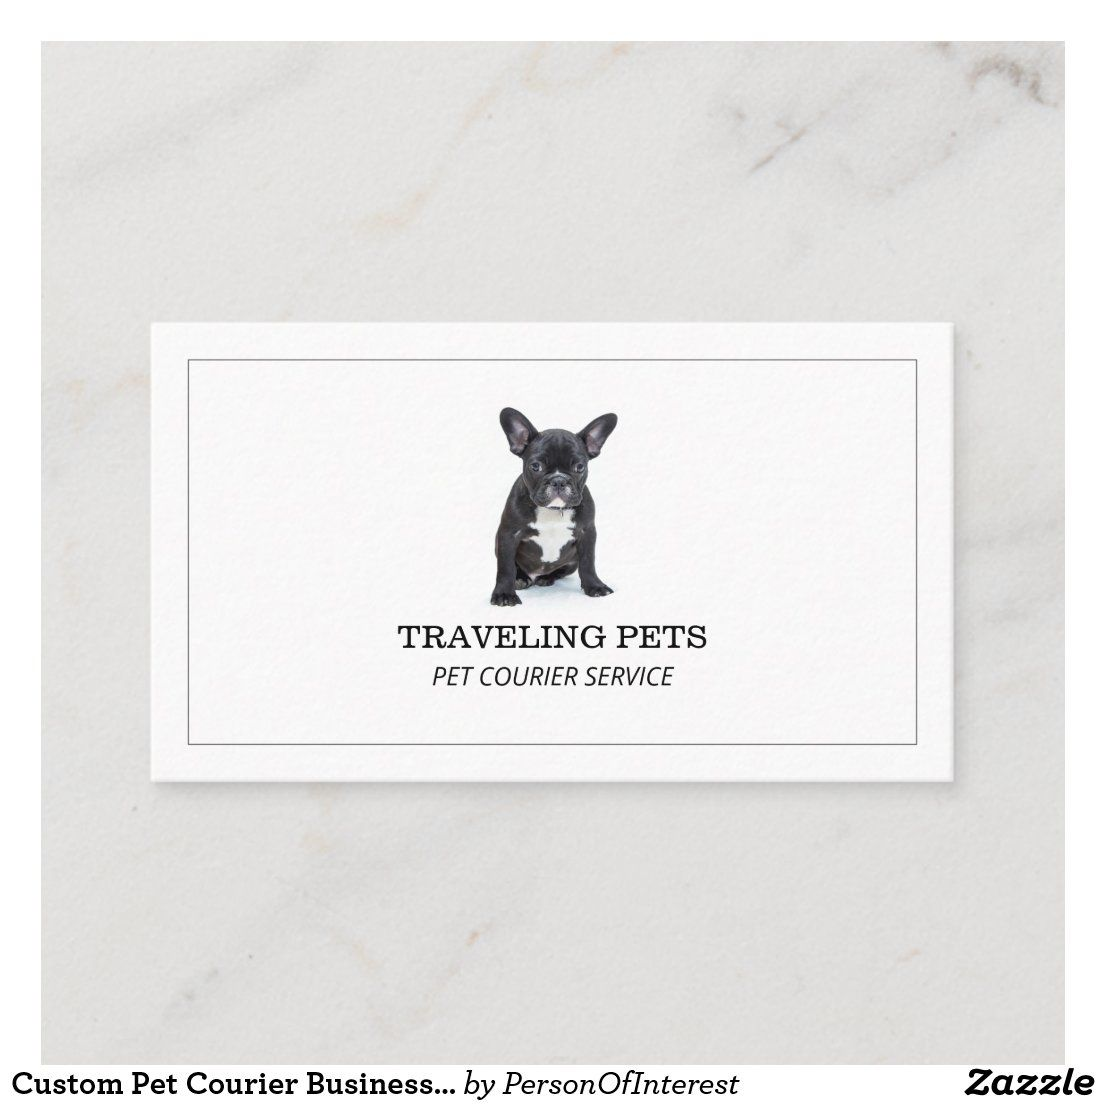 Custom Pet Courier Business Card Zazzle Com Pets Service Animal Pet Travel